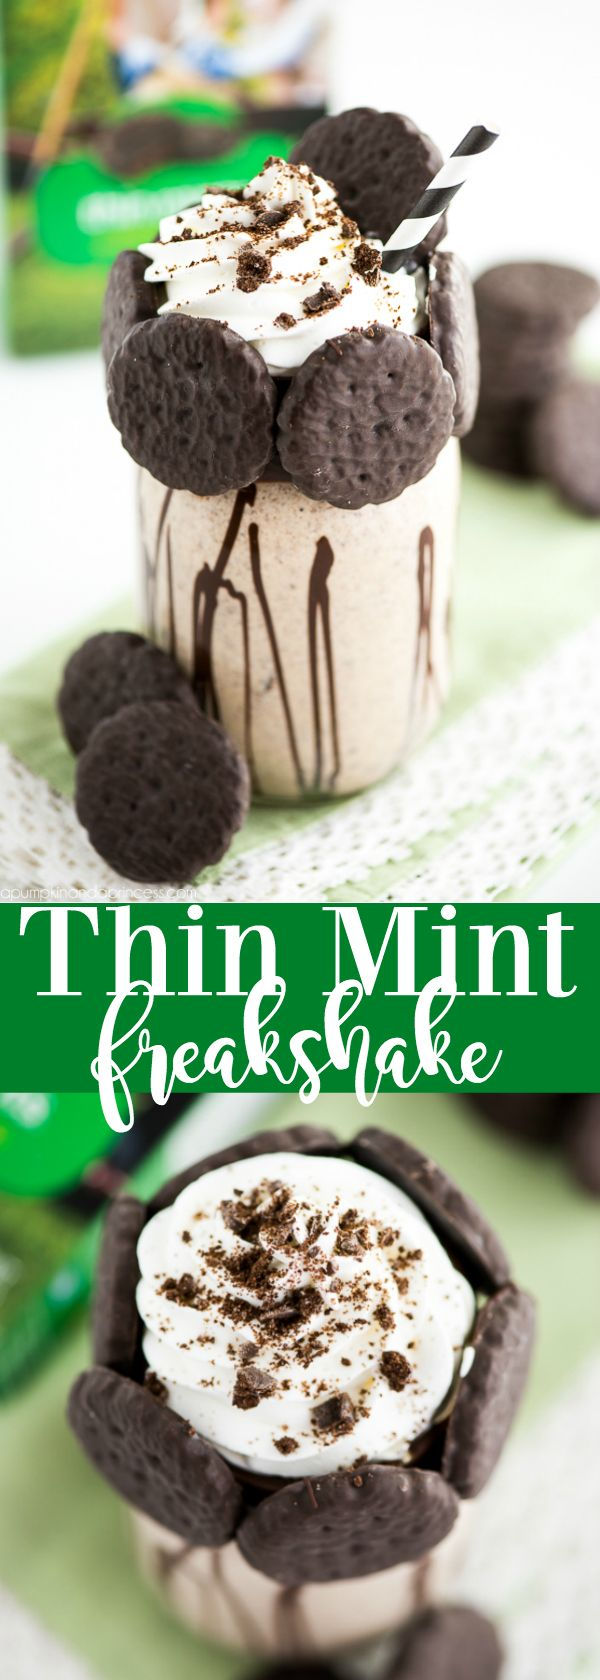 Thin Mint Freakshake Recipe